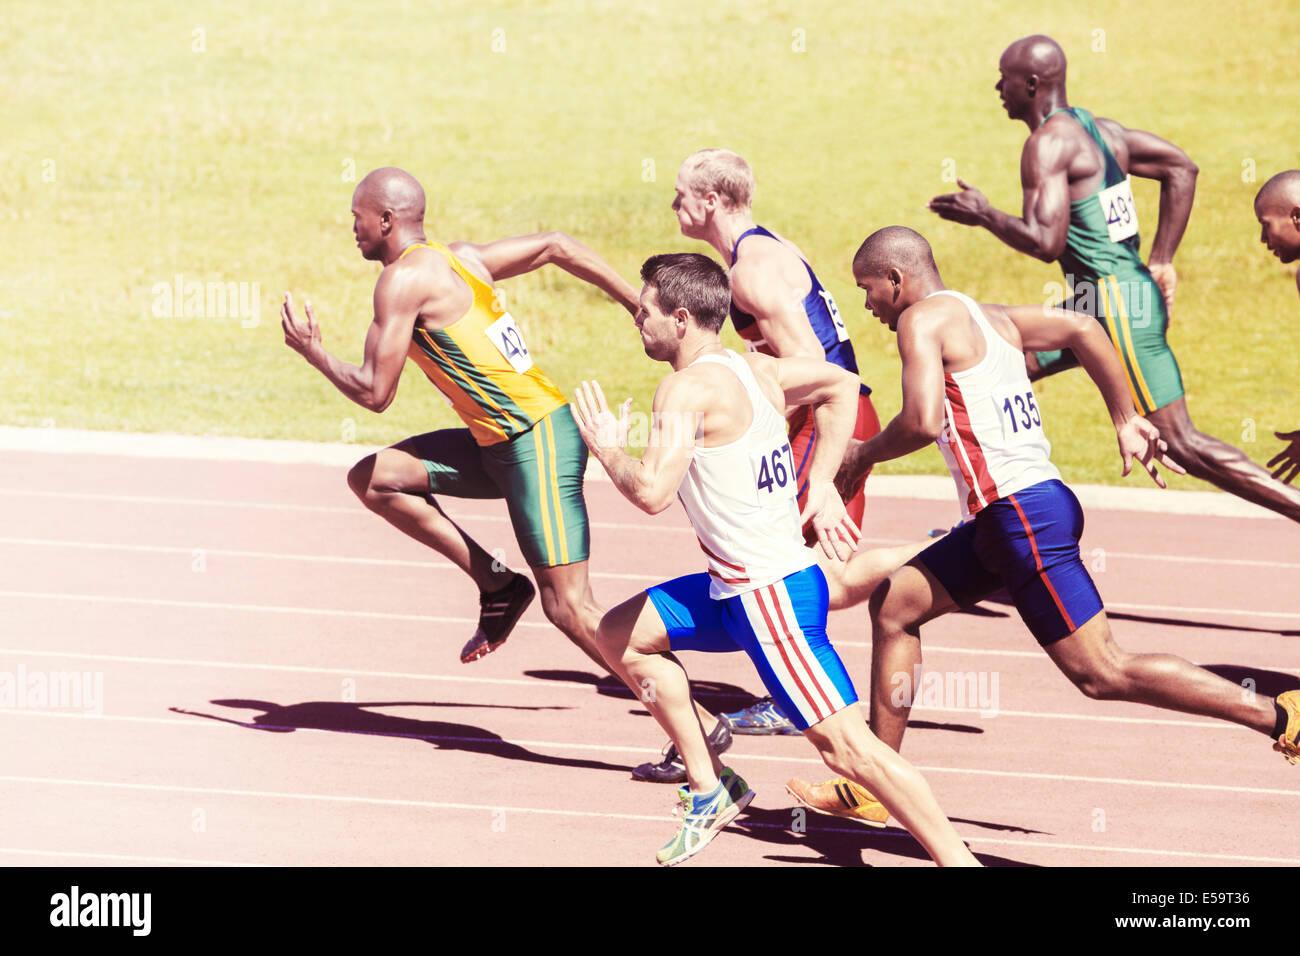 Sprinters racing on track - Stock Image